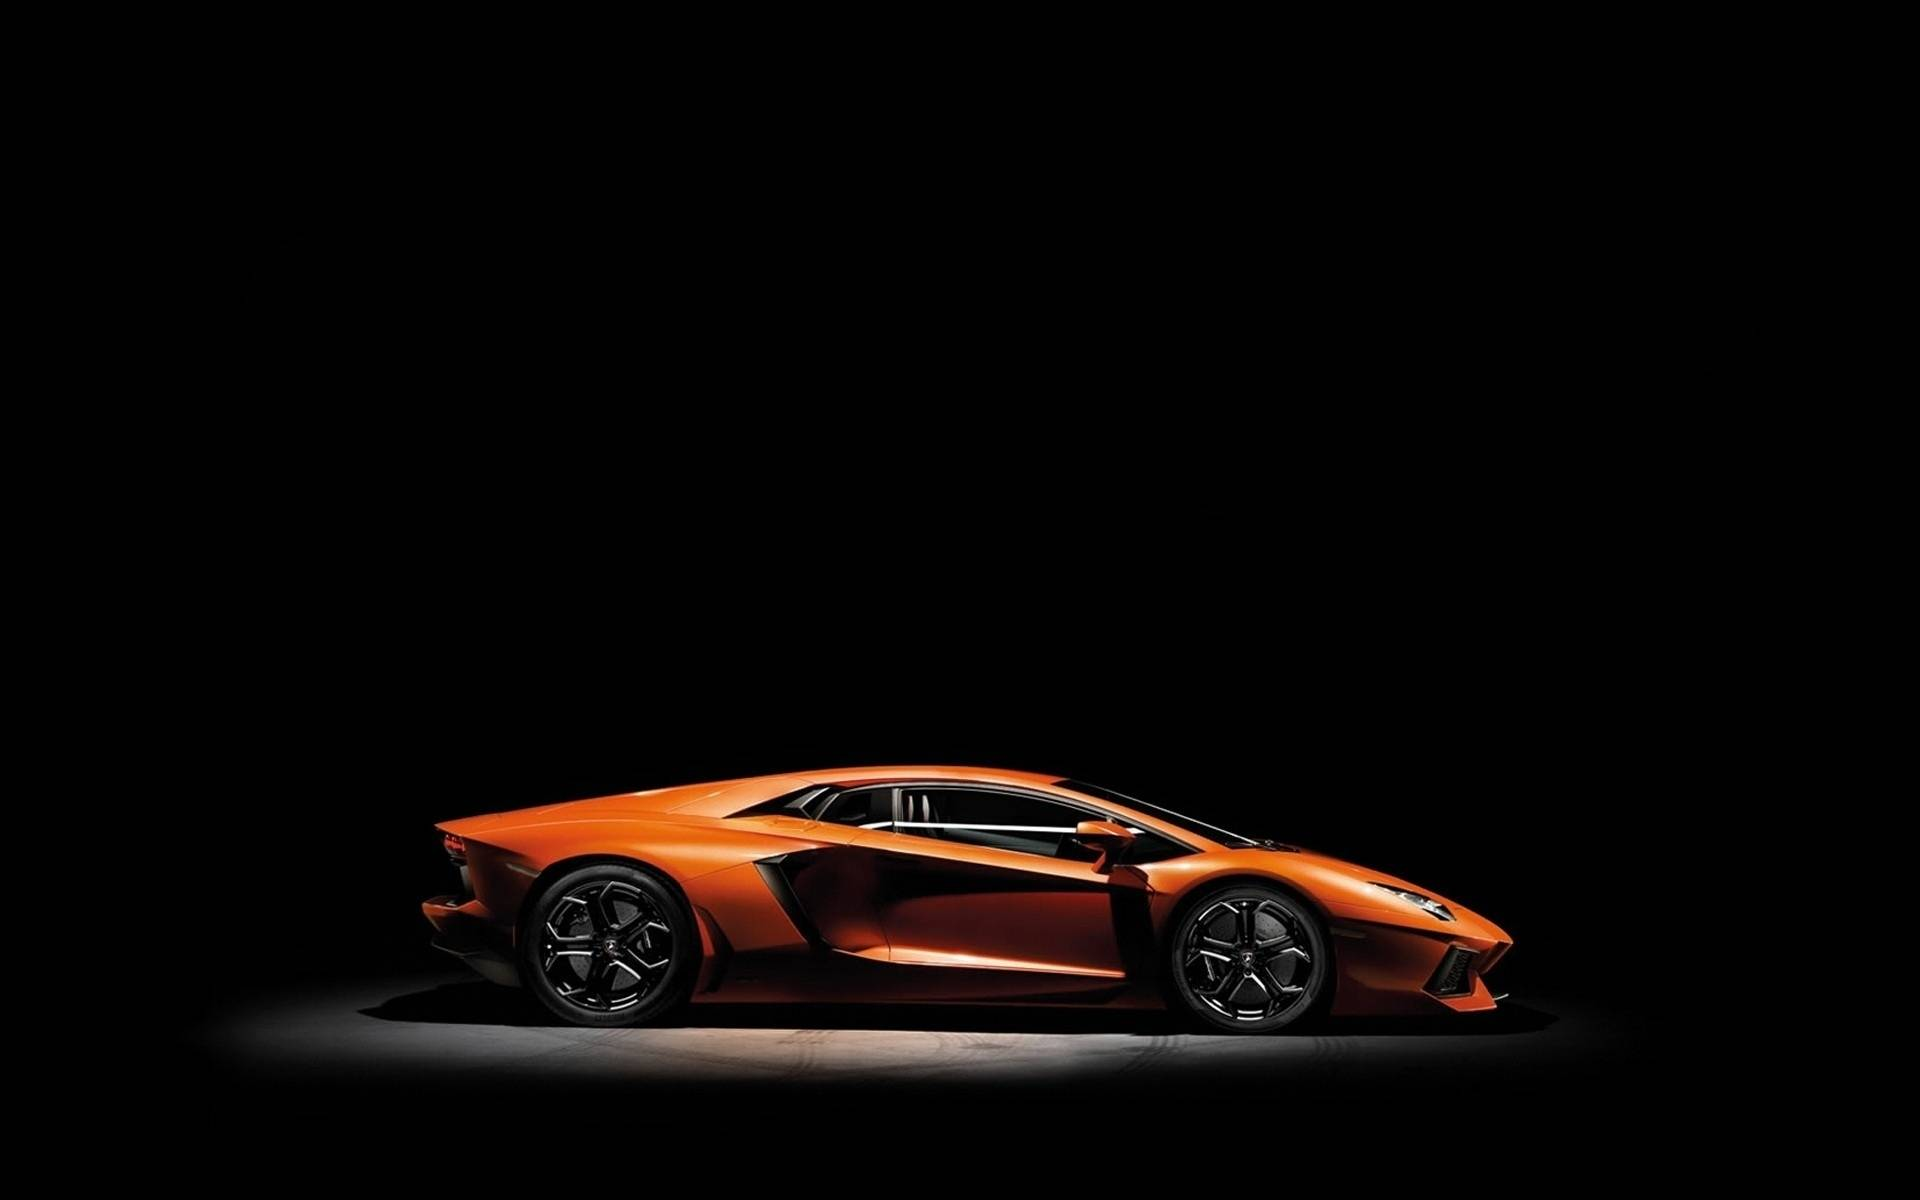 Автомобили 3 HD обои - Cool Cars 3 HD обои для Андроид - скачать APK | 1200x1920